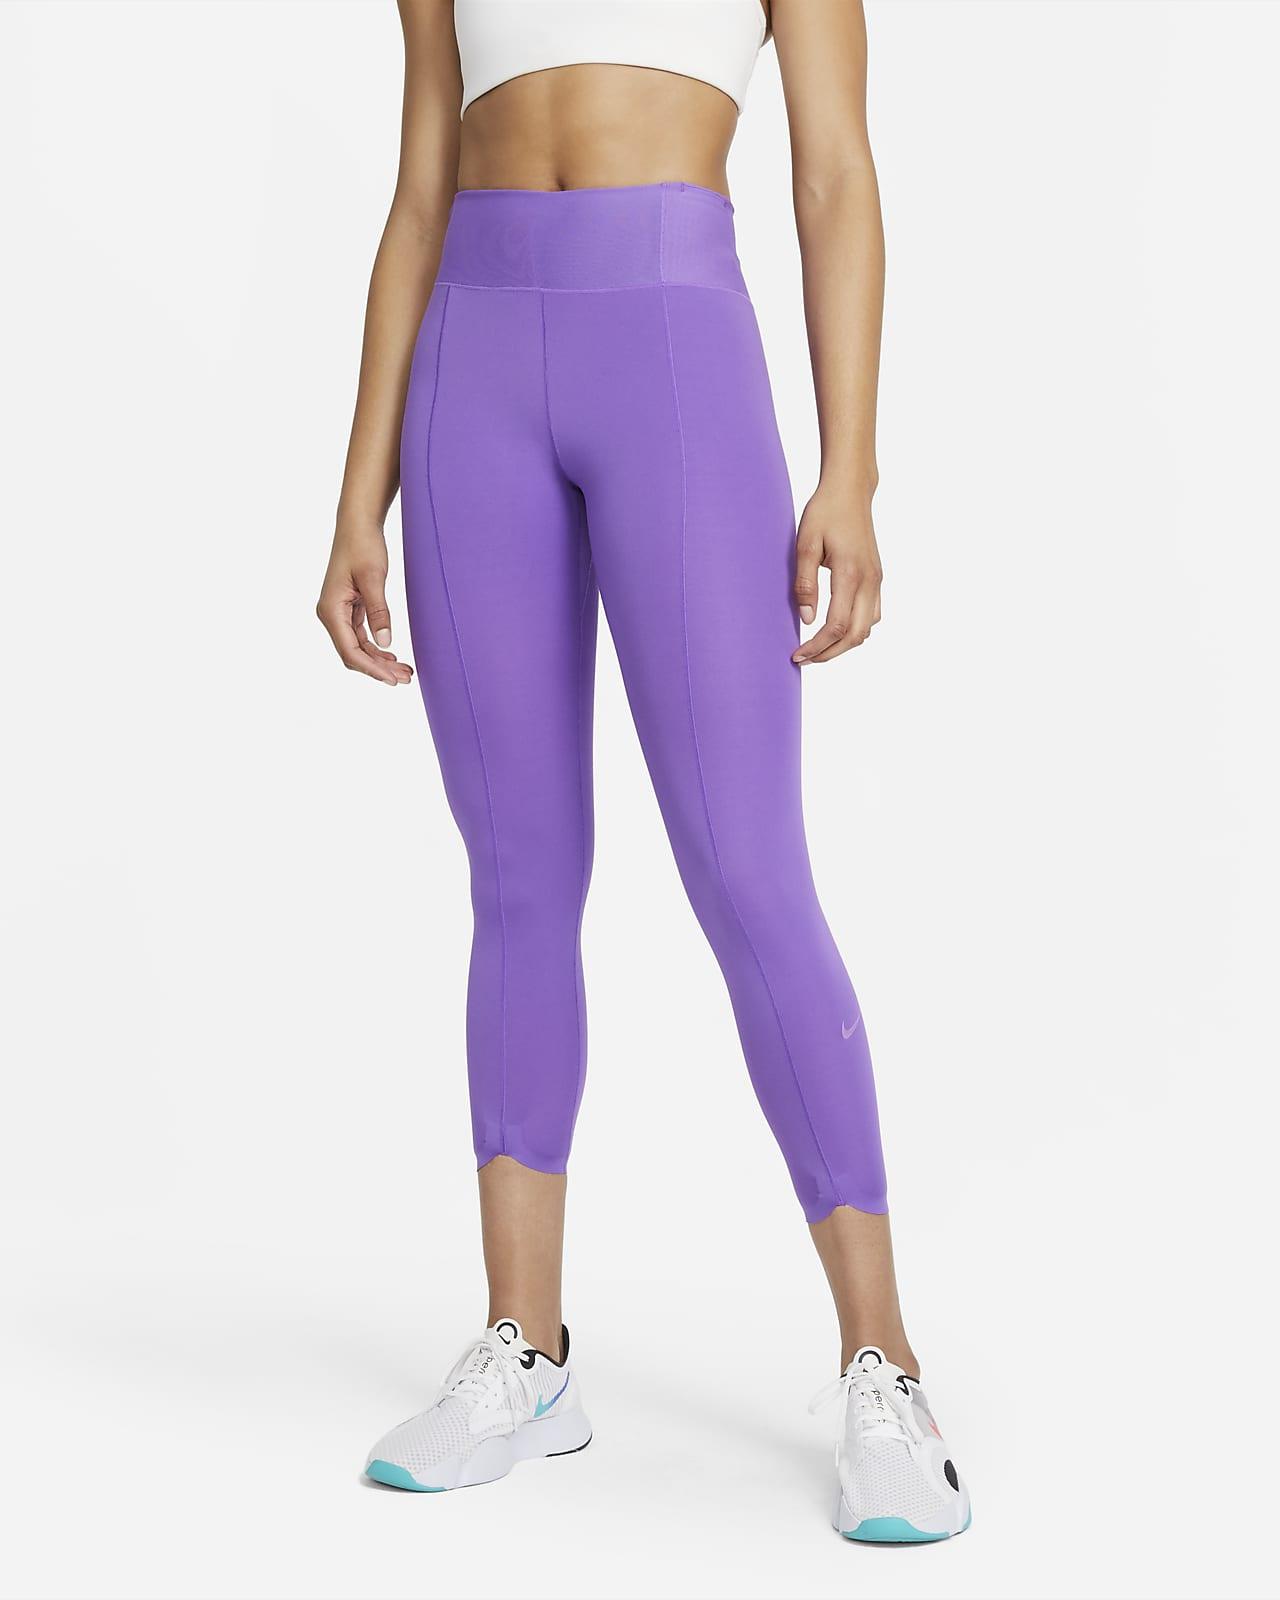 Korta leggings Nike One Luxe Icon Clash för kvinnor